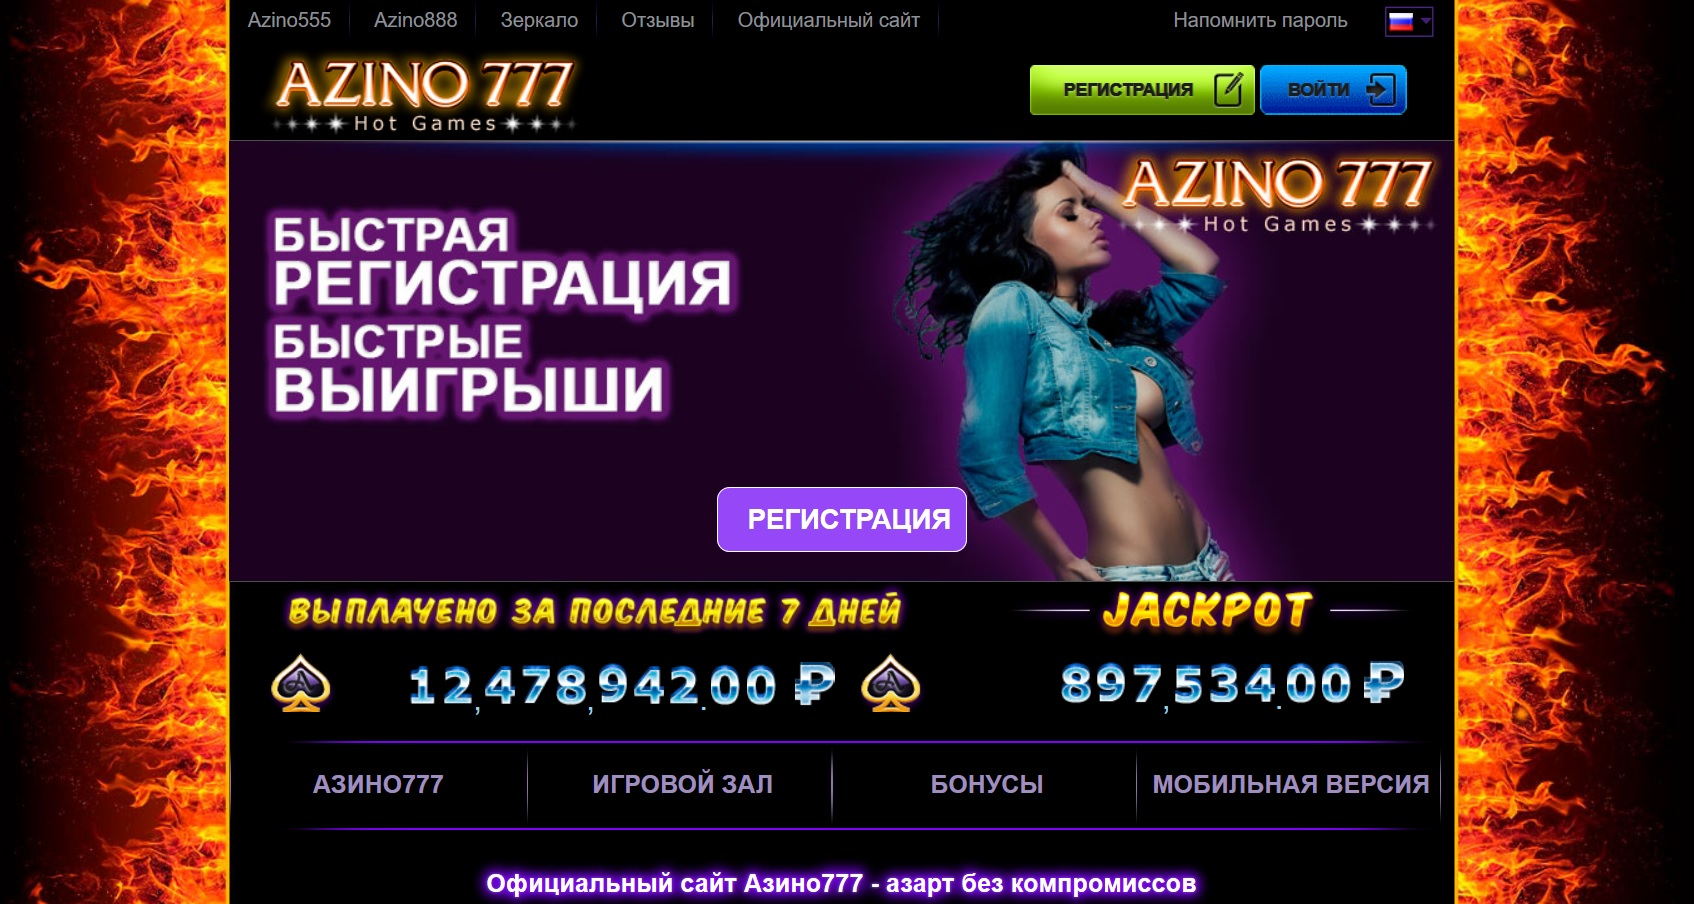 азино777 мобайл официальный сайт